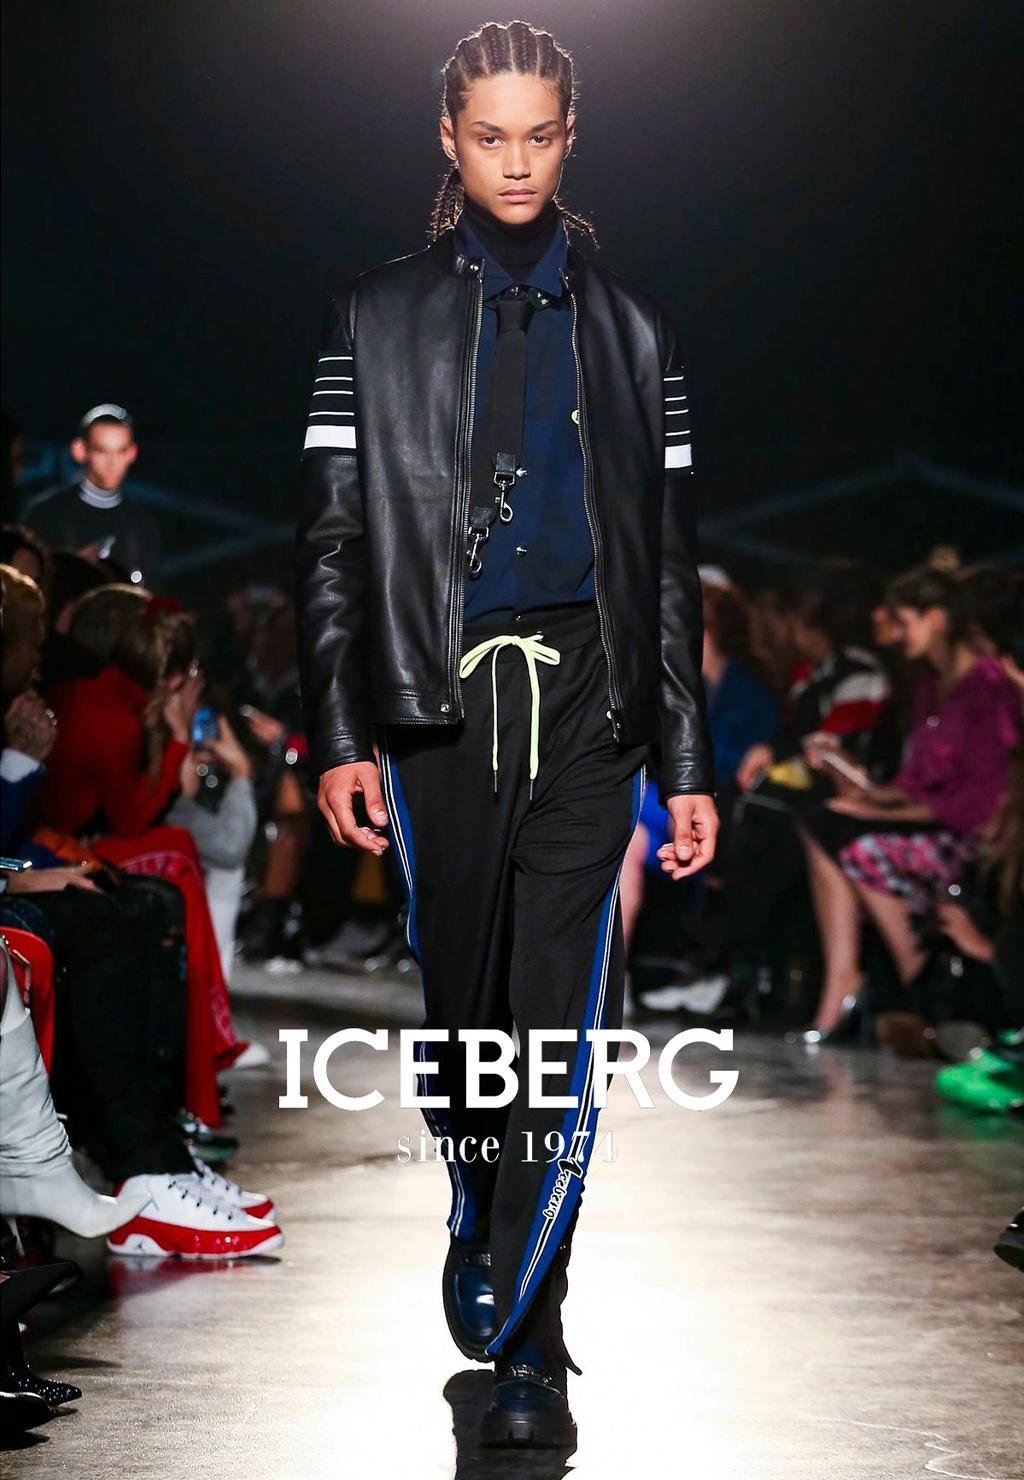 site-Joaquim - Iceberg-Menswear-FW20-Milan-1 - 2020